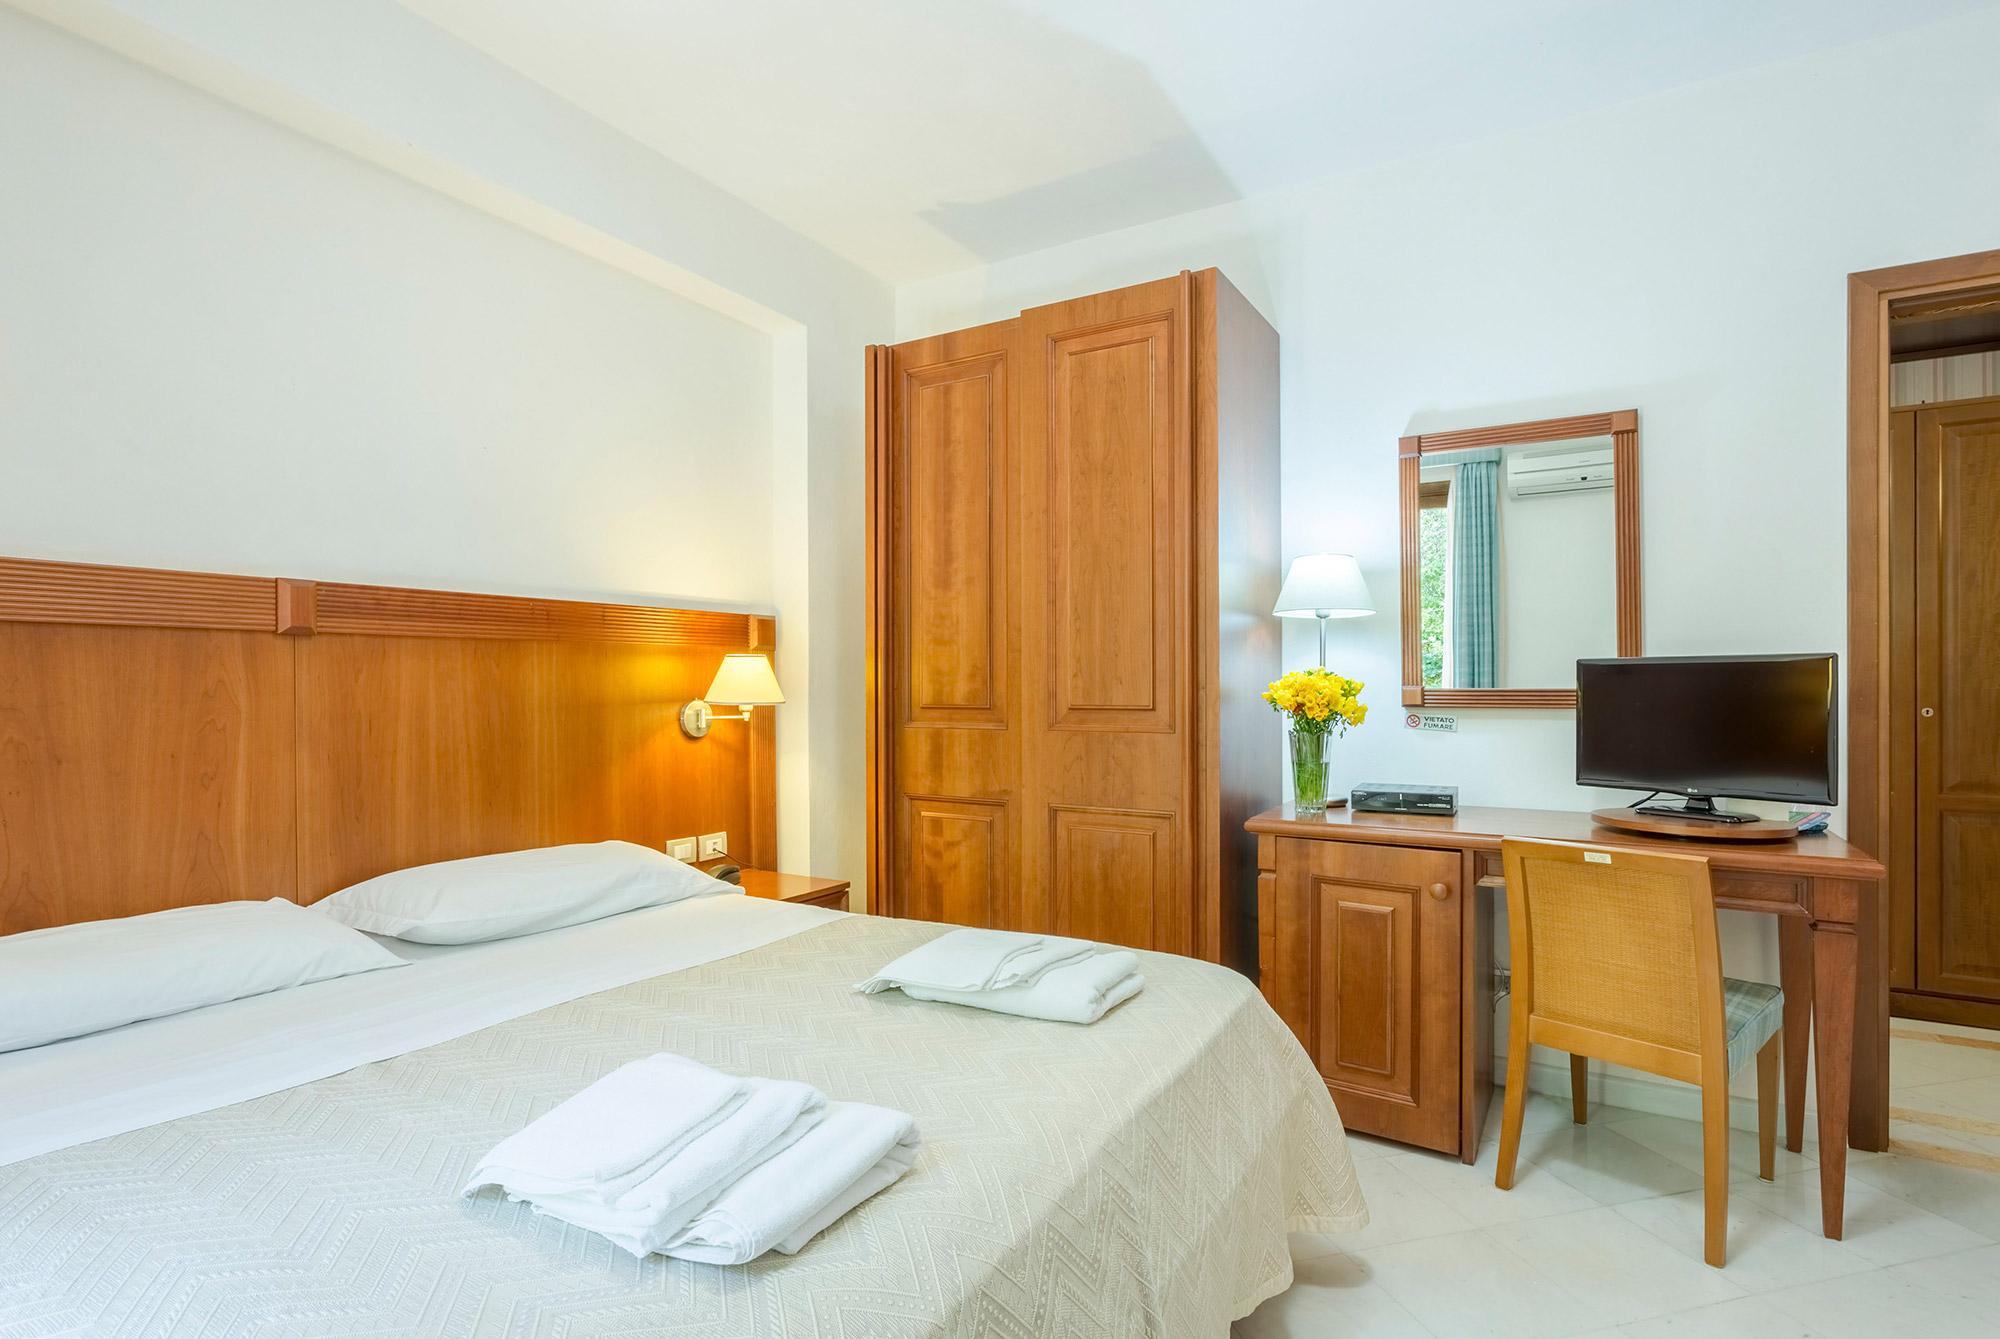 Matrimoniale Standard - Albero Auralba - San Vito Lo Capo